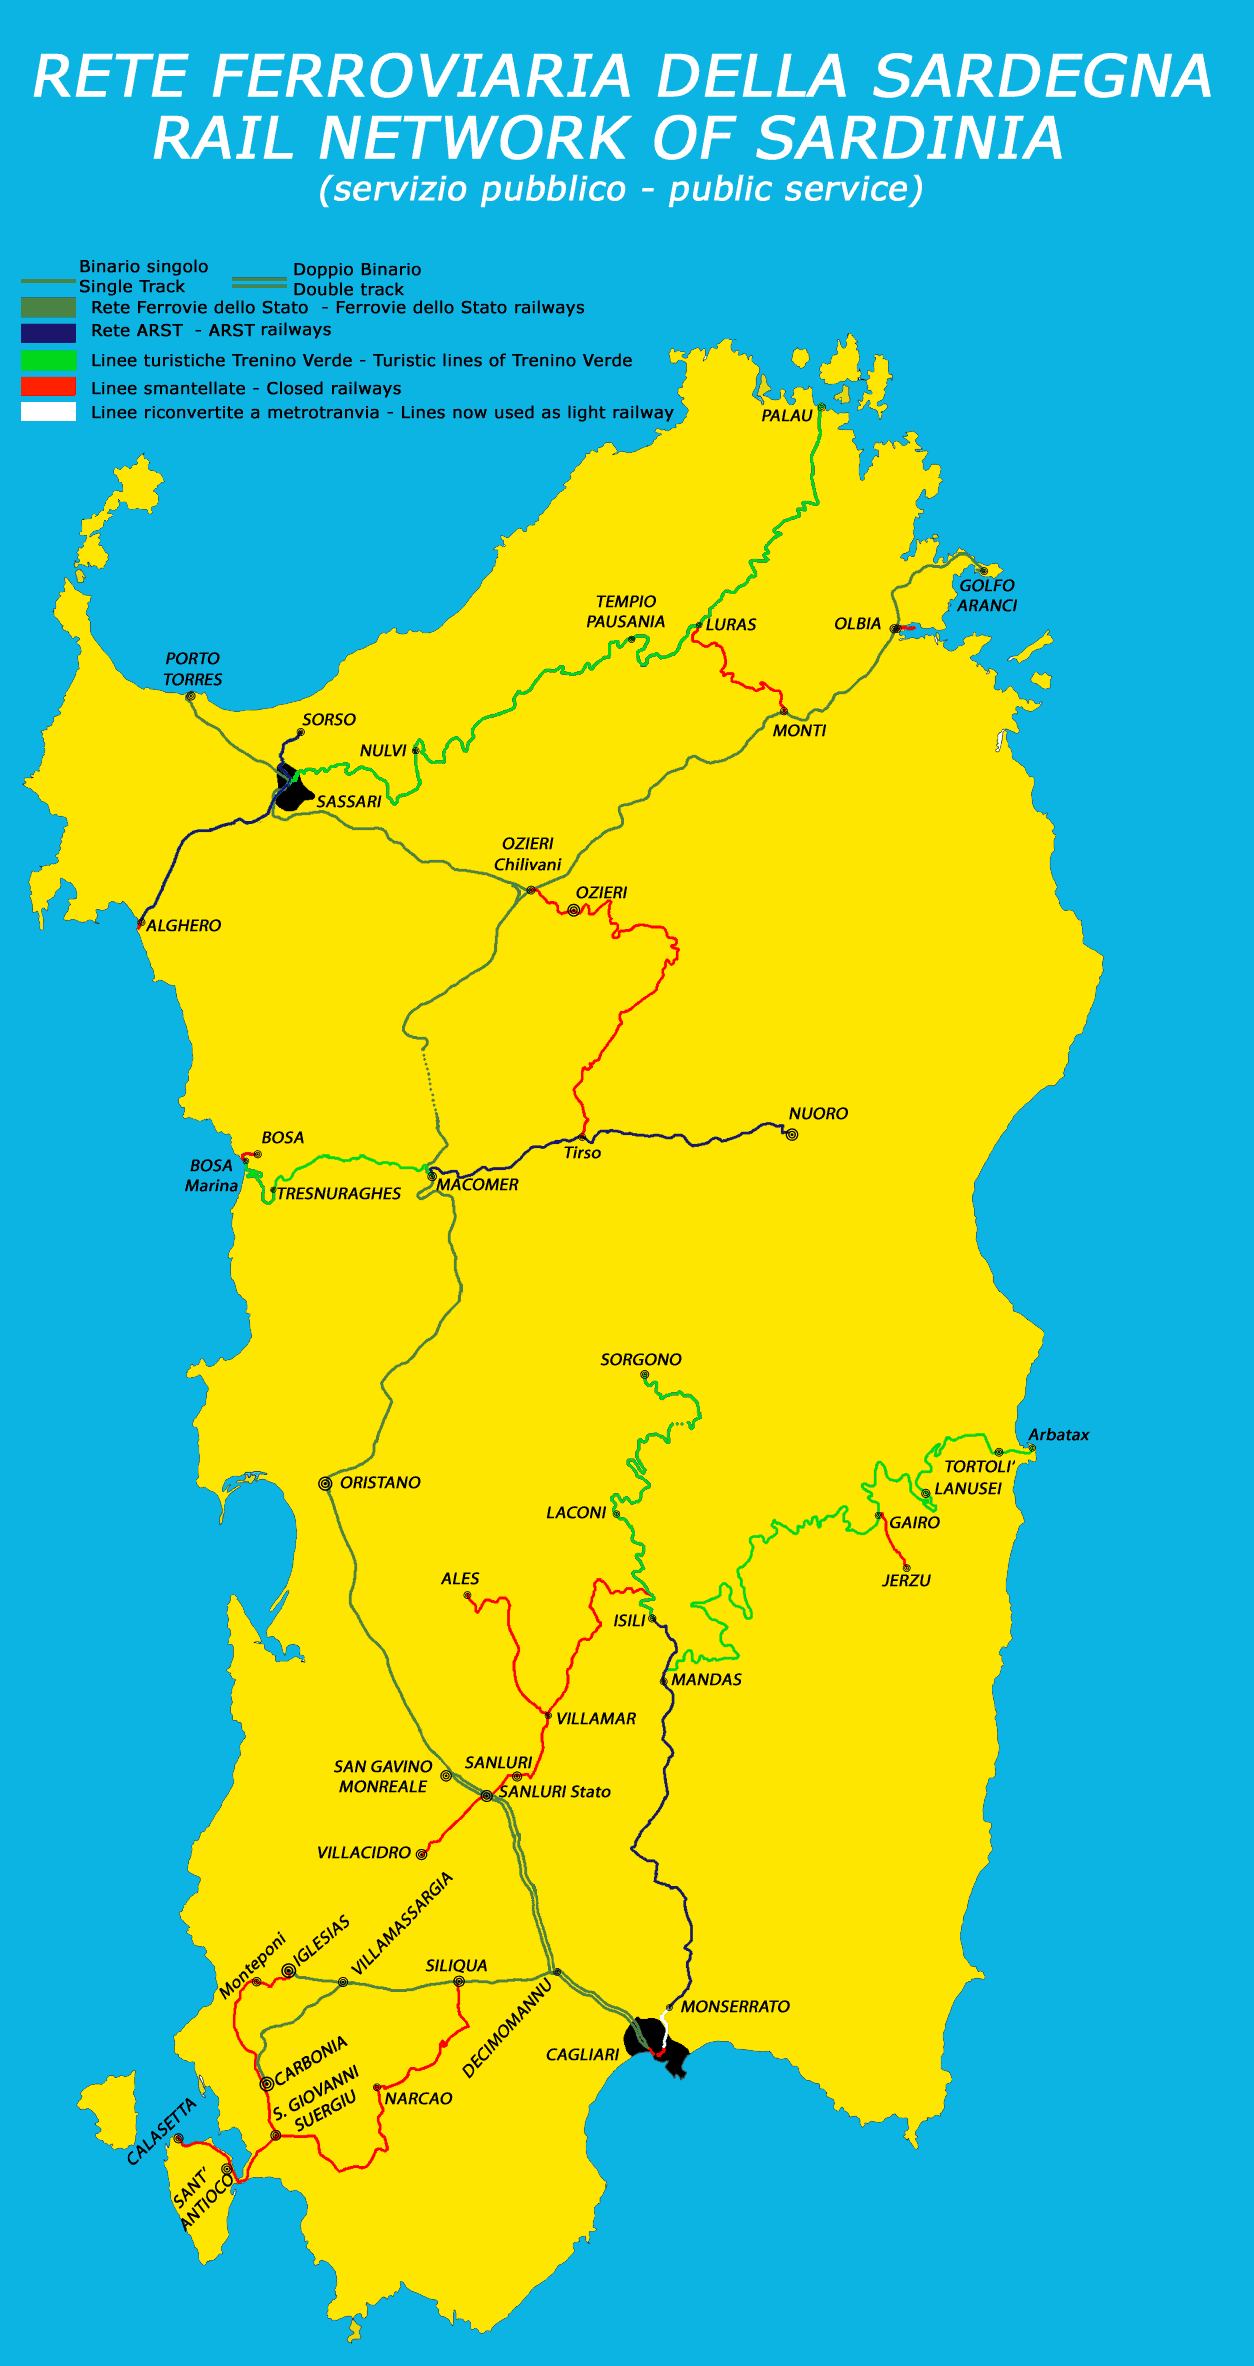 Sardinia Island rail network